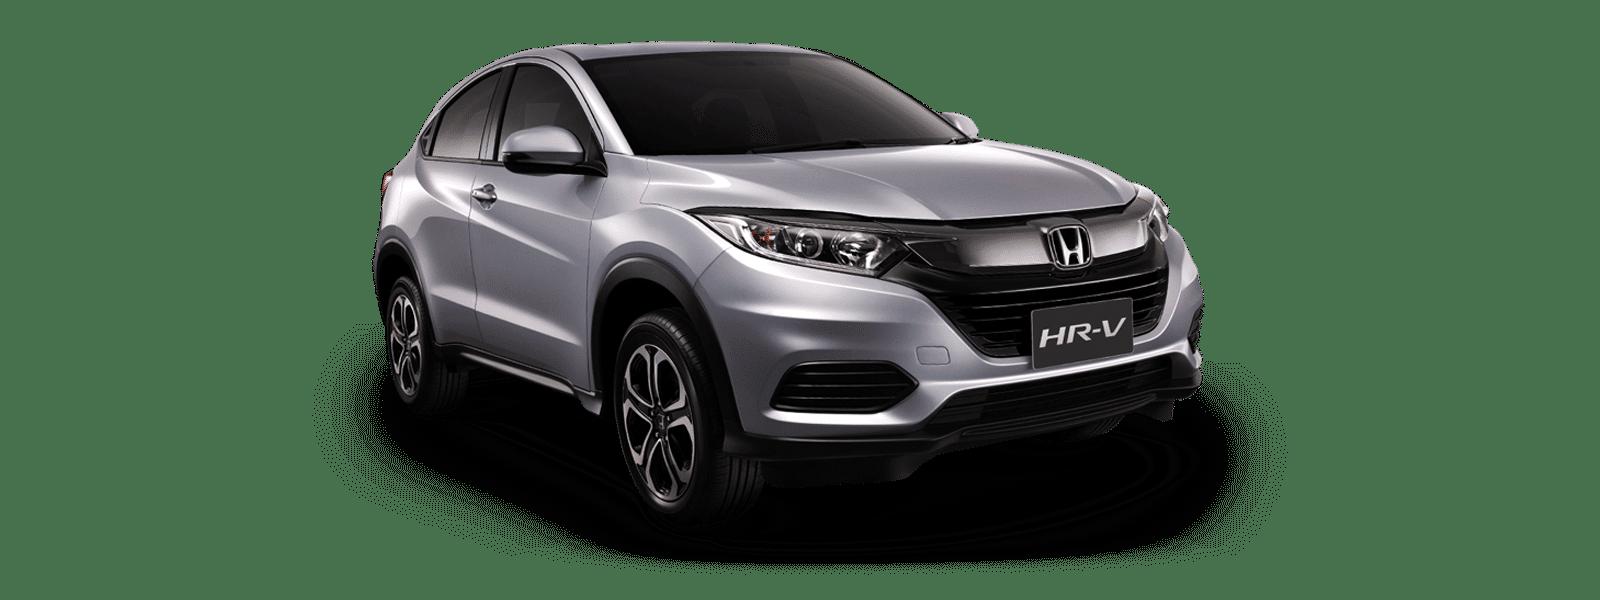 1. Honda HR-V 2021 รุ่น E ราคา 949,000 บาท